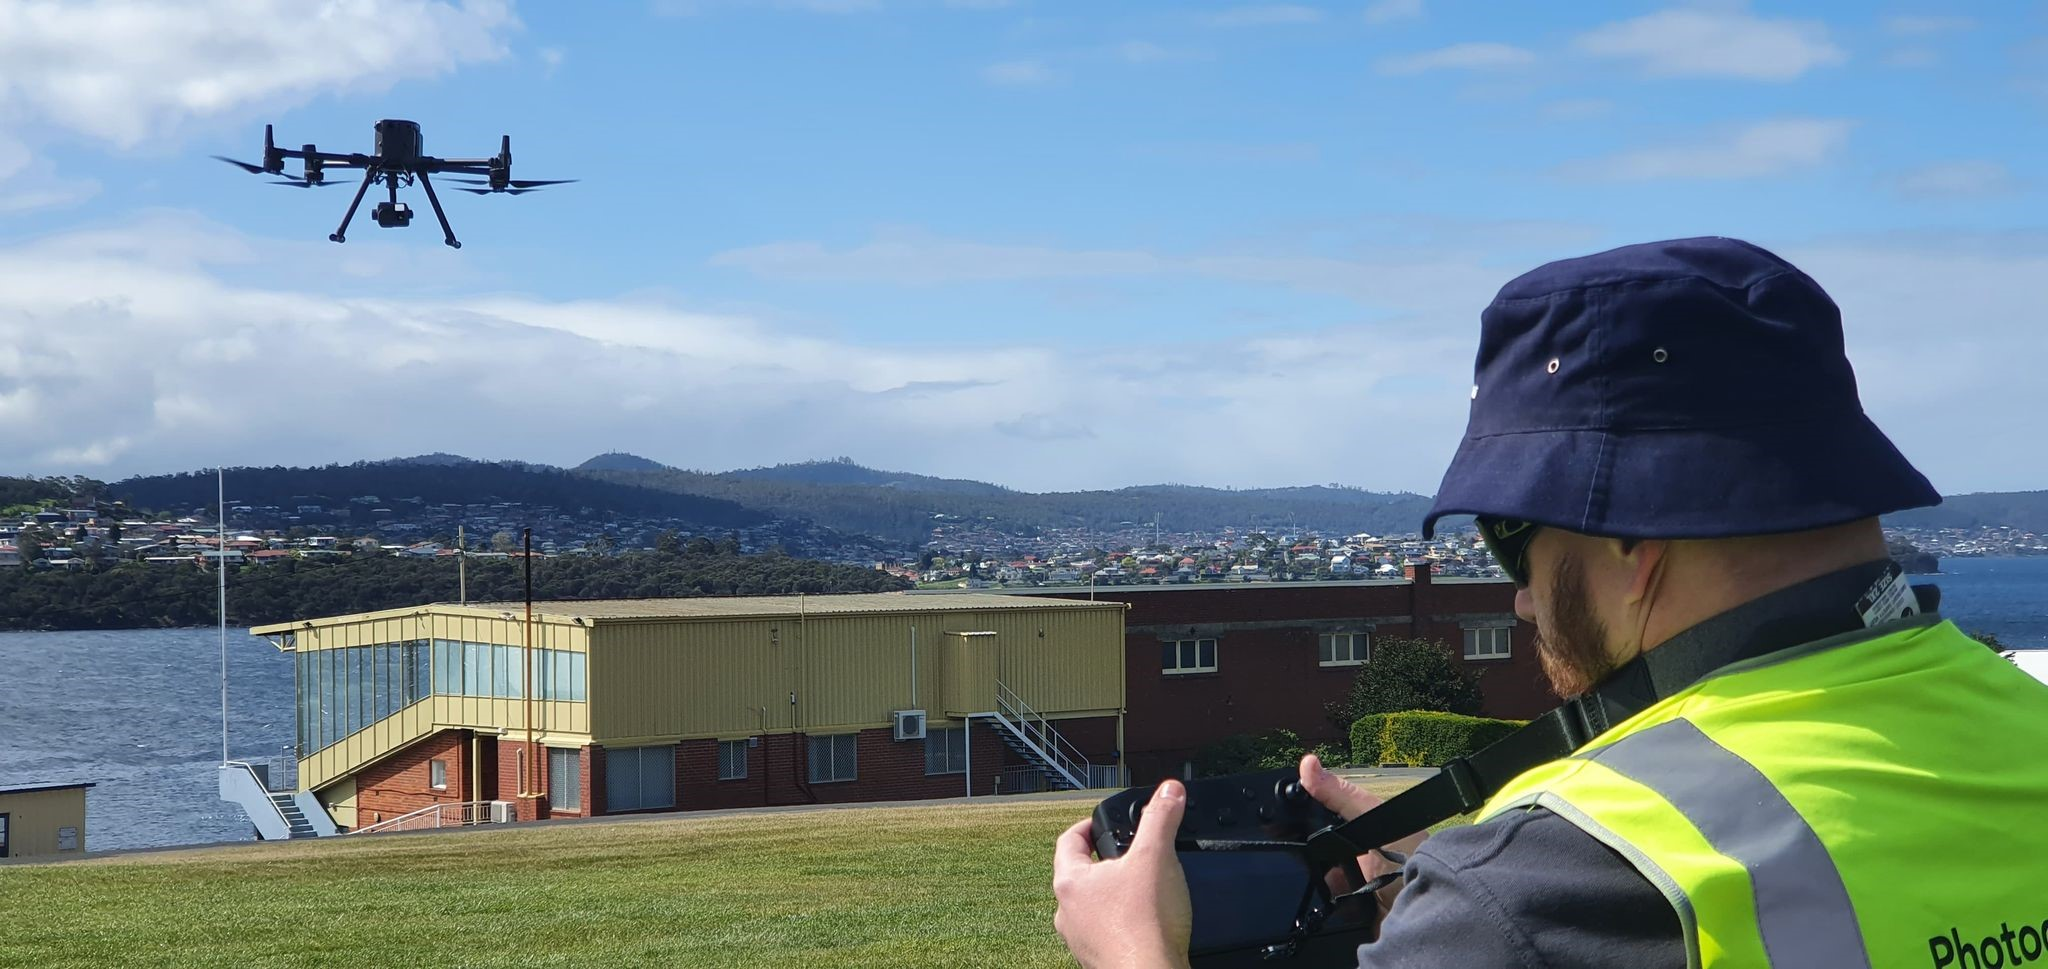 Craig Garth flying the Matrice 300 RTK at the Hobart Cenotaph